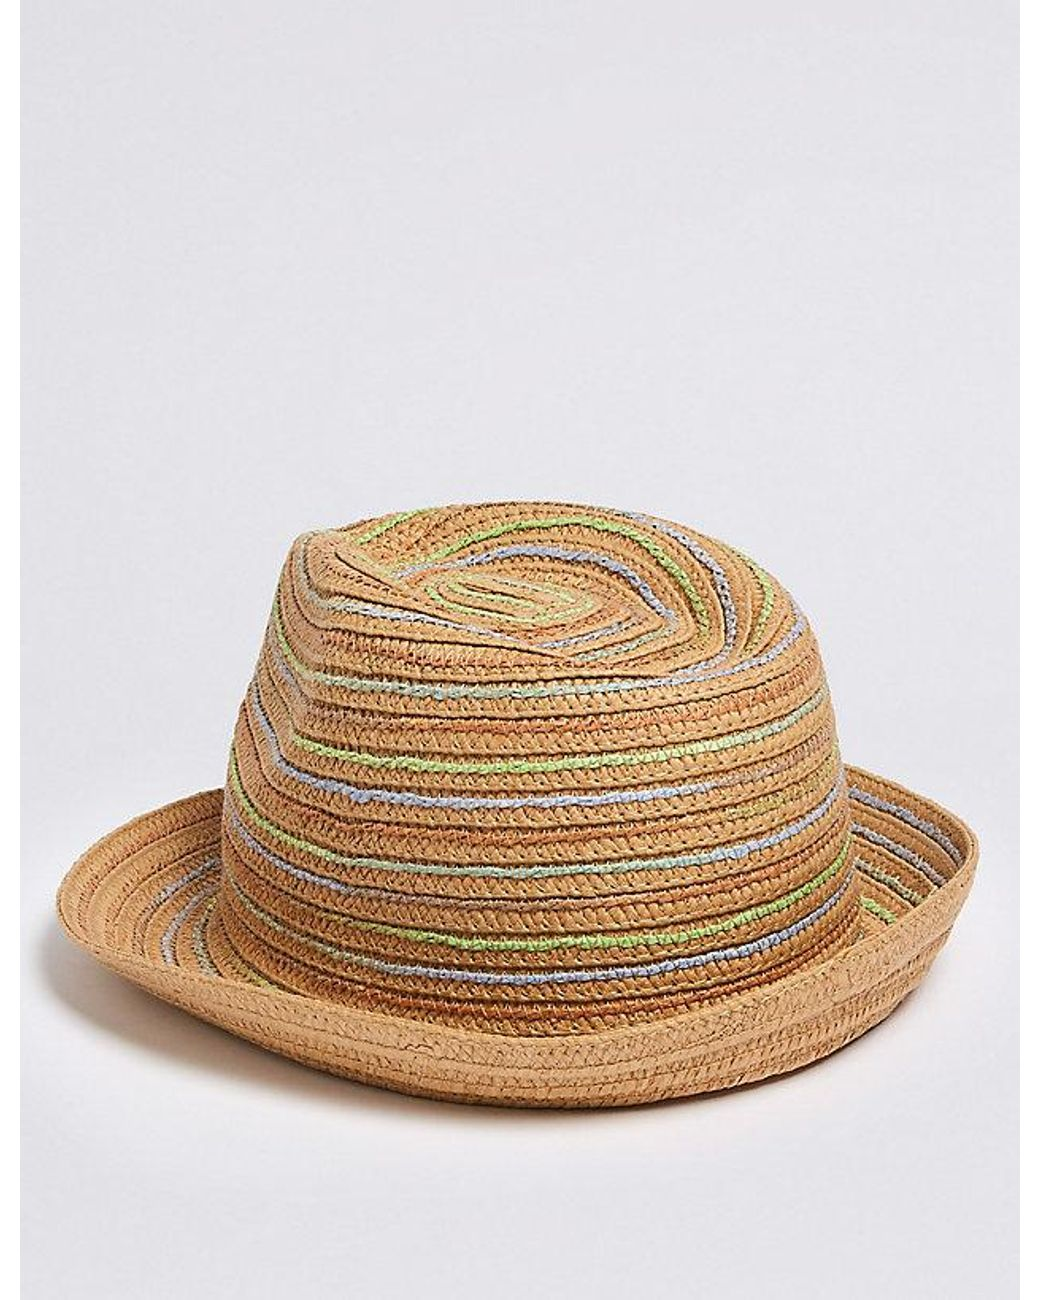 1daff07c2 Lyst - Marks & Spencer Kids' Straw Trilby Hat With Sun Smart Upf50+ ...